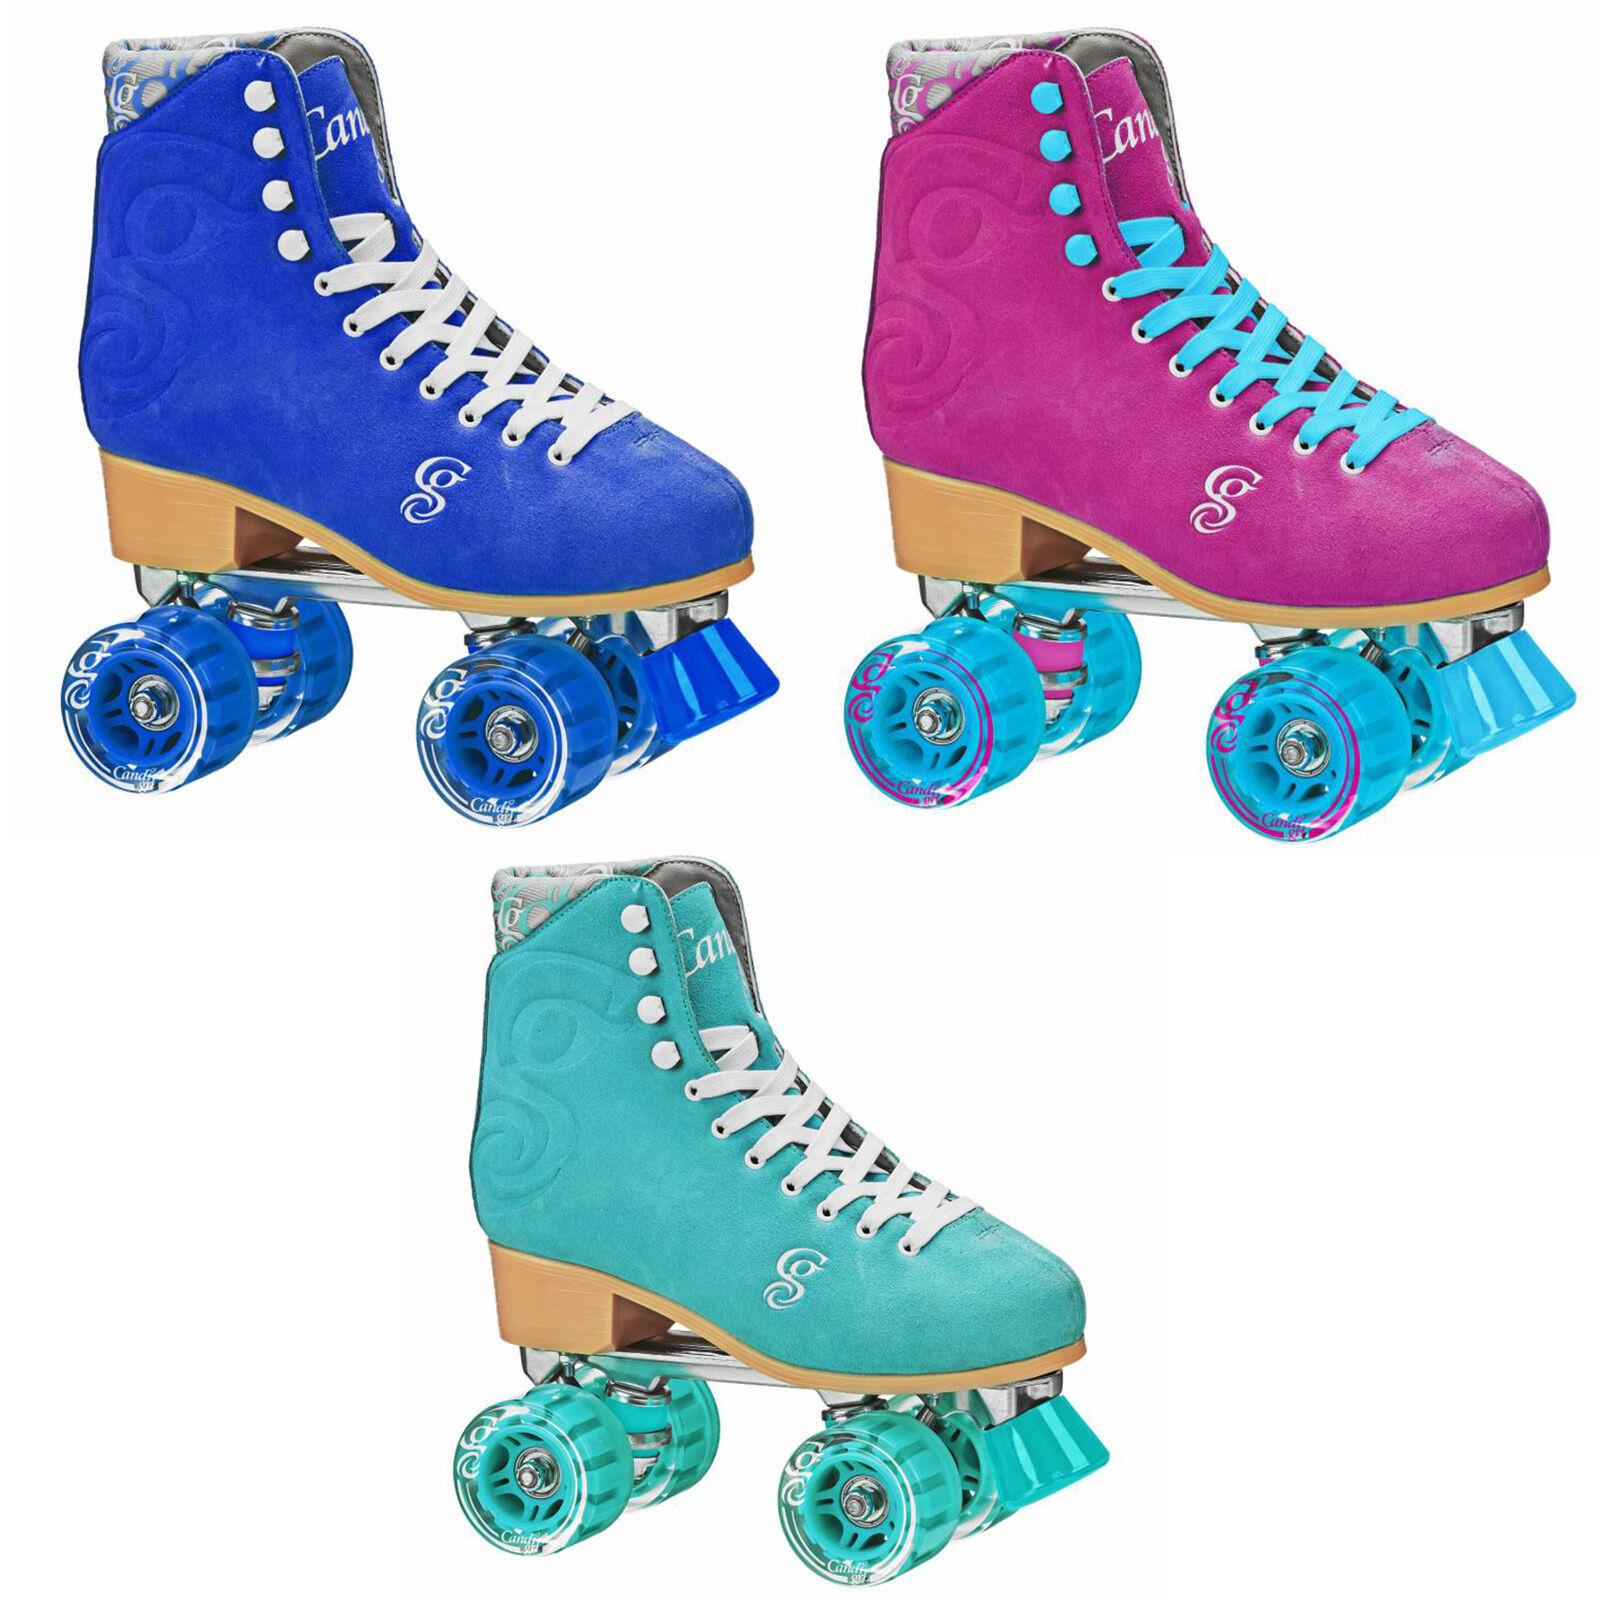 Candi Girl Recreational Indoor Outdoor Roller Skates From Ro